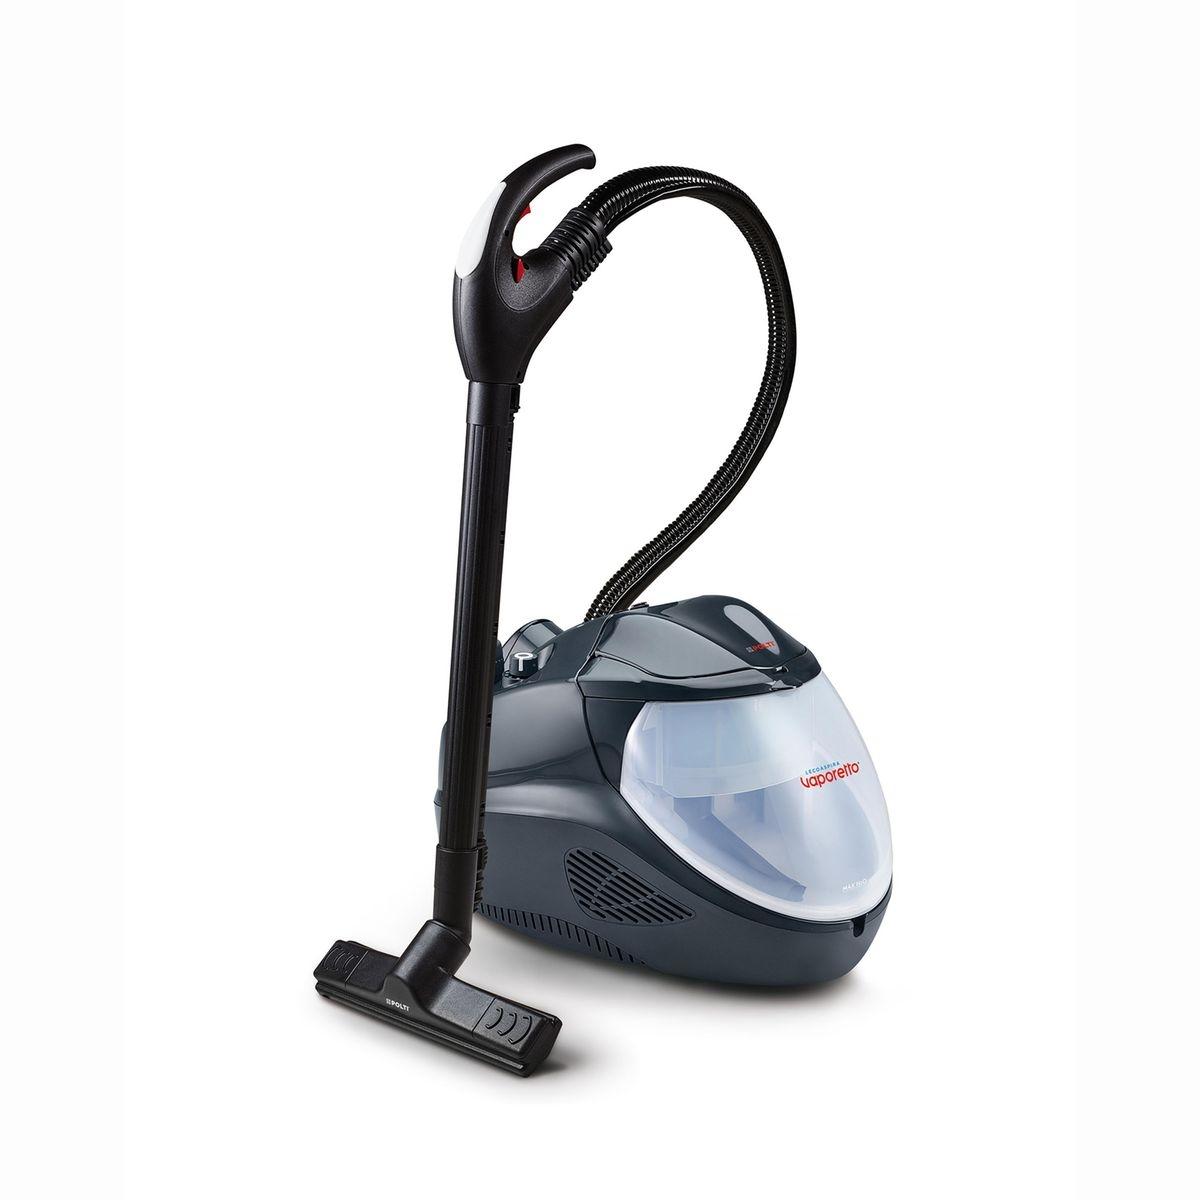 aspirateur et nettoyeur vapeur steam jet ssnv1400 011 2. Black Bedroom Furniture Sets. Home Design Ideas